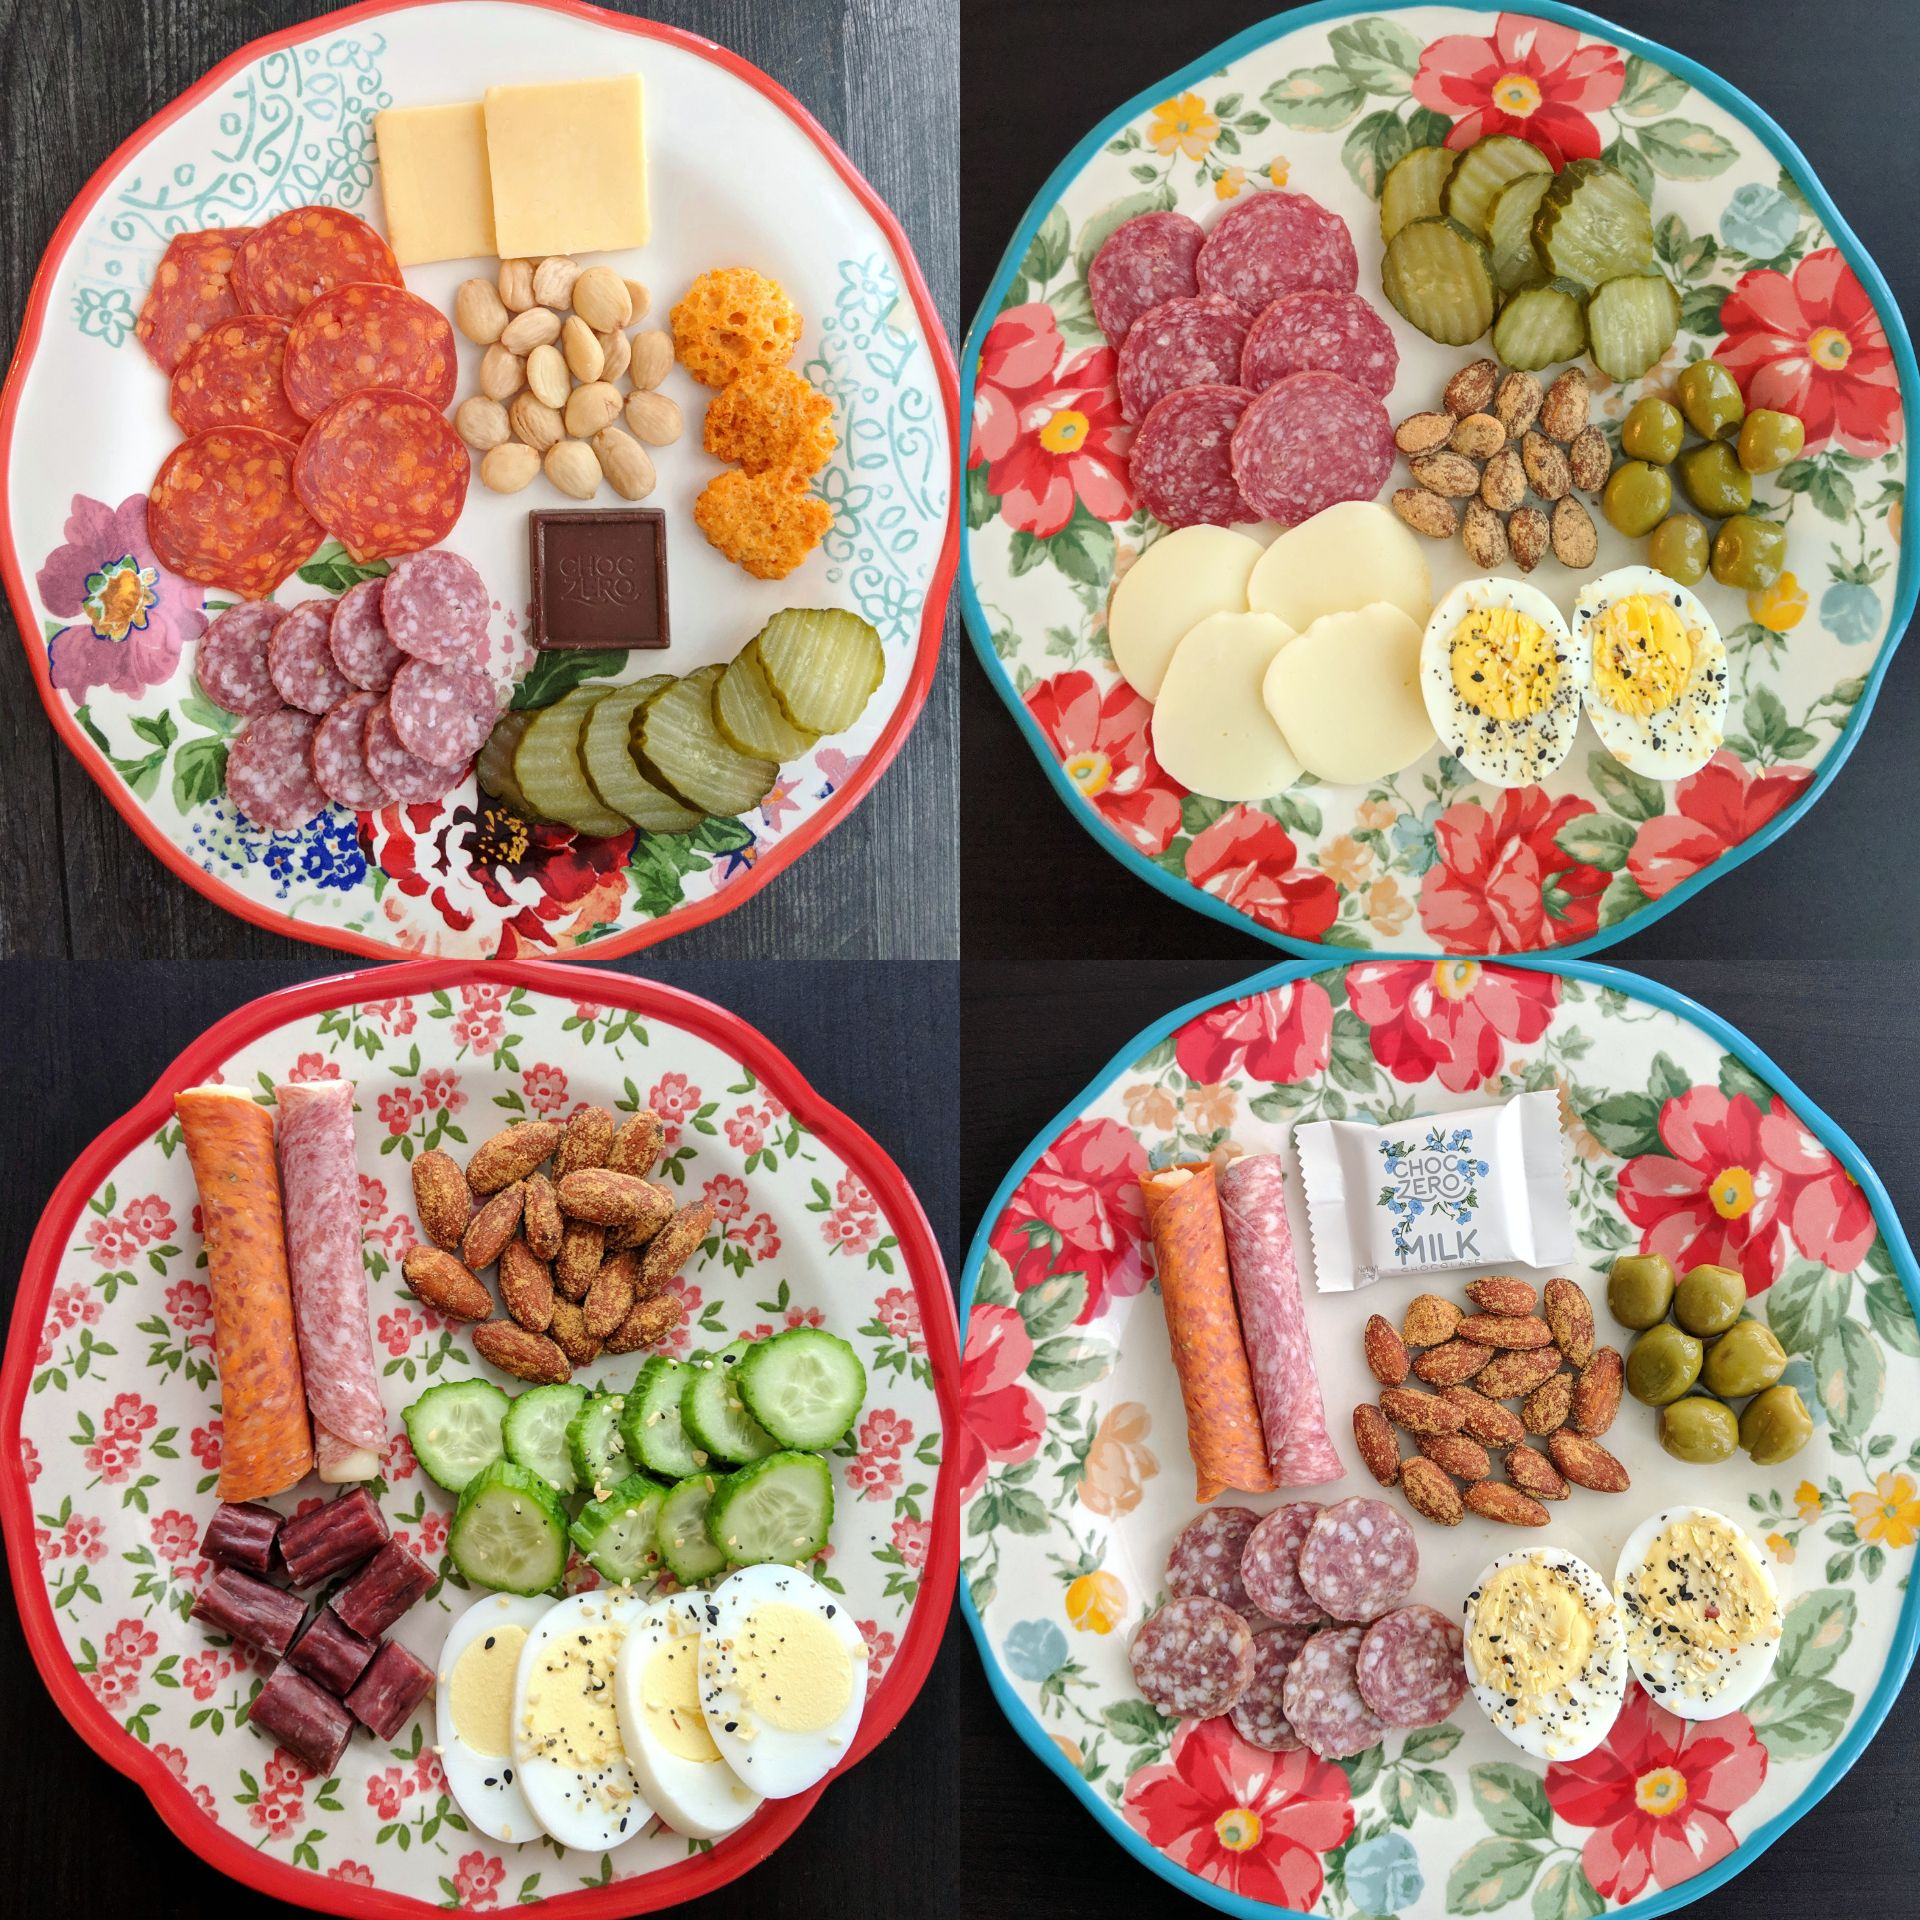 Keto friendly snack plates 2 snack plate diabetic